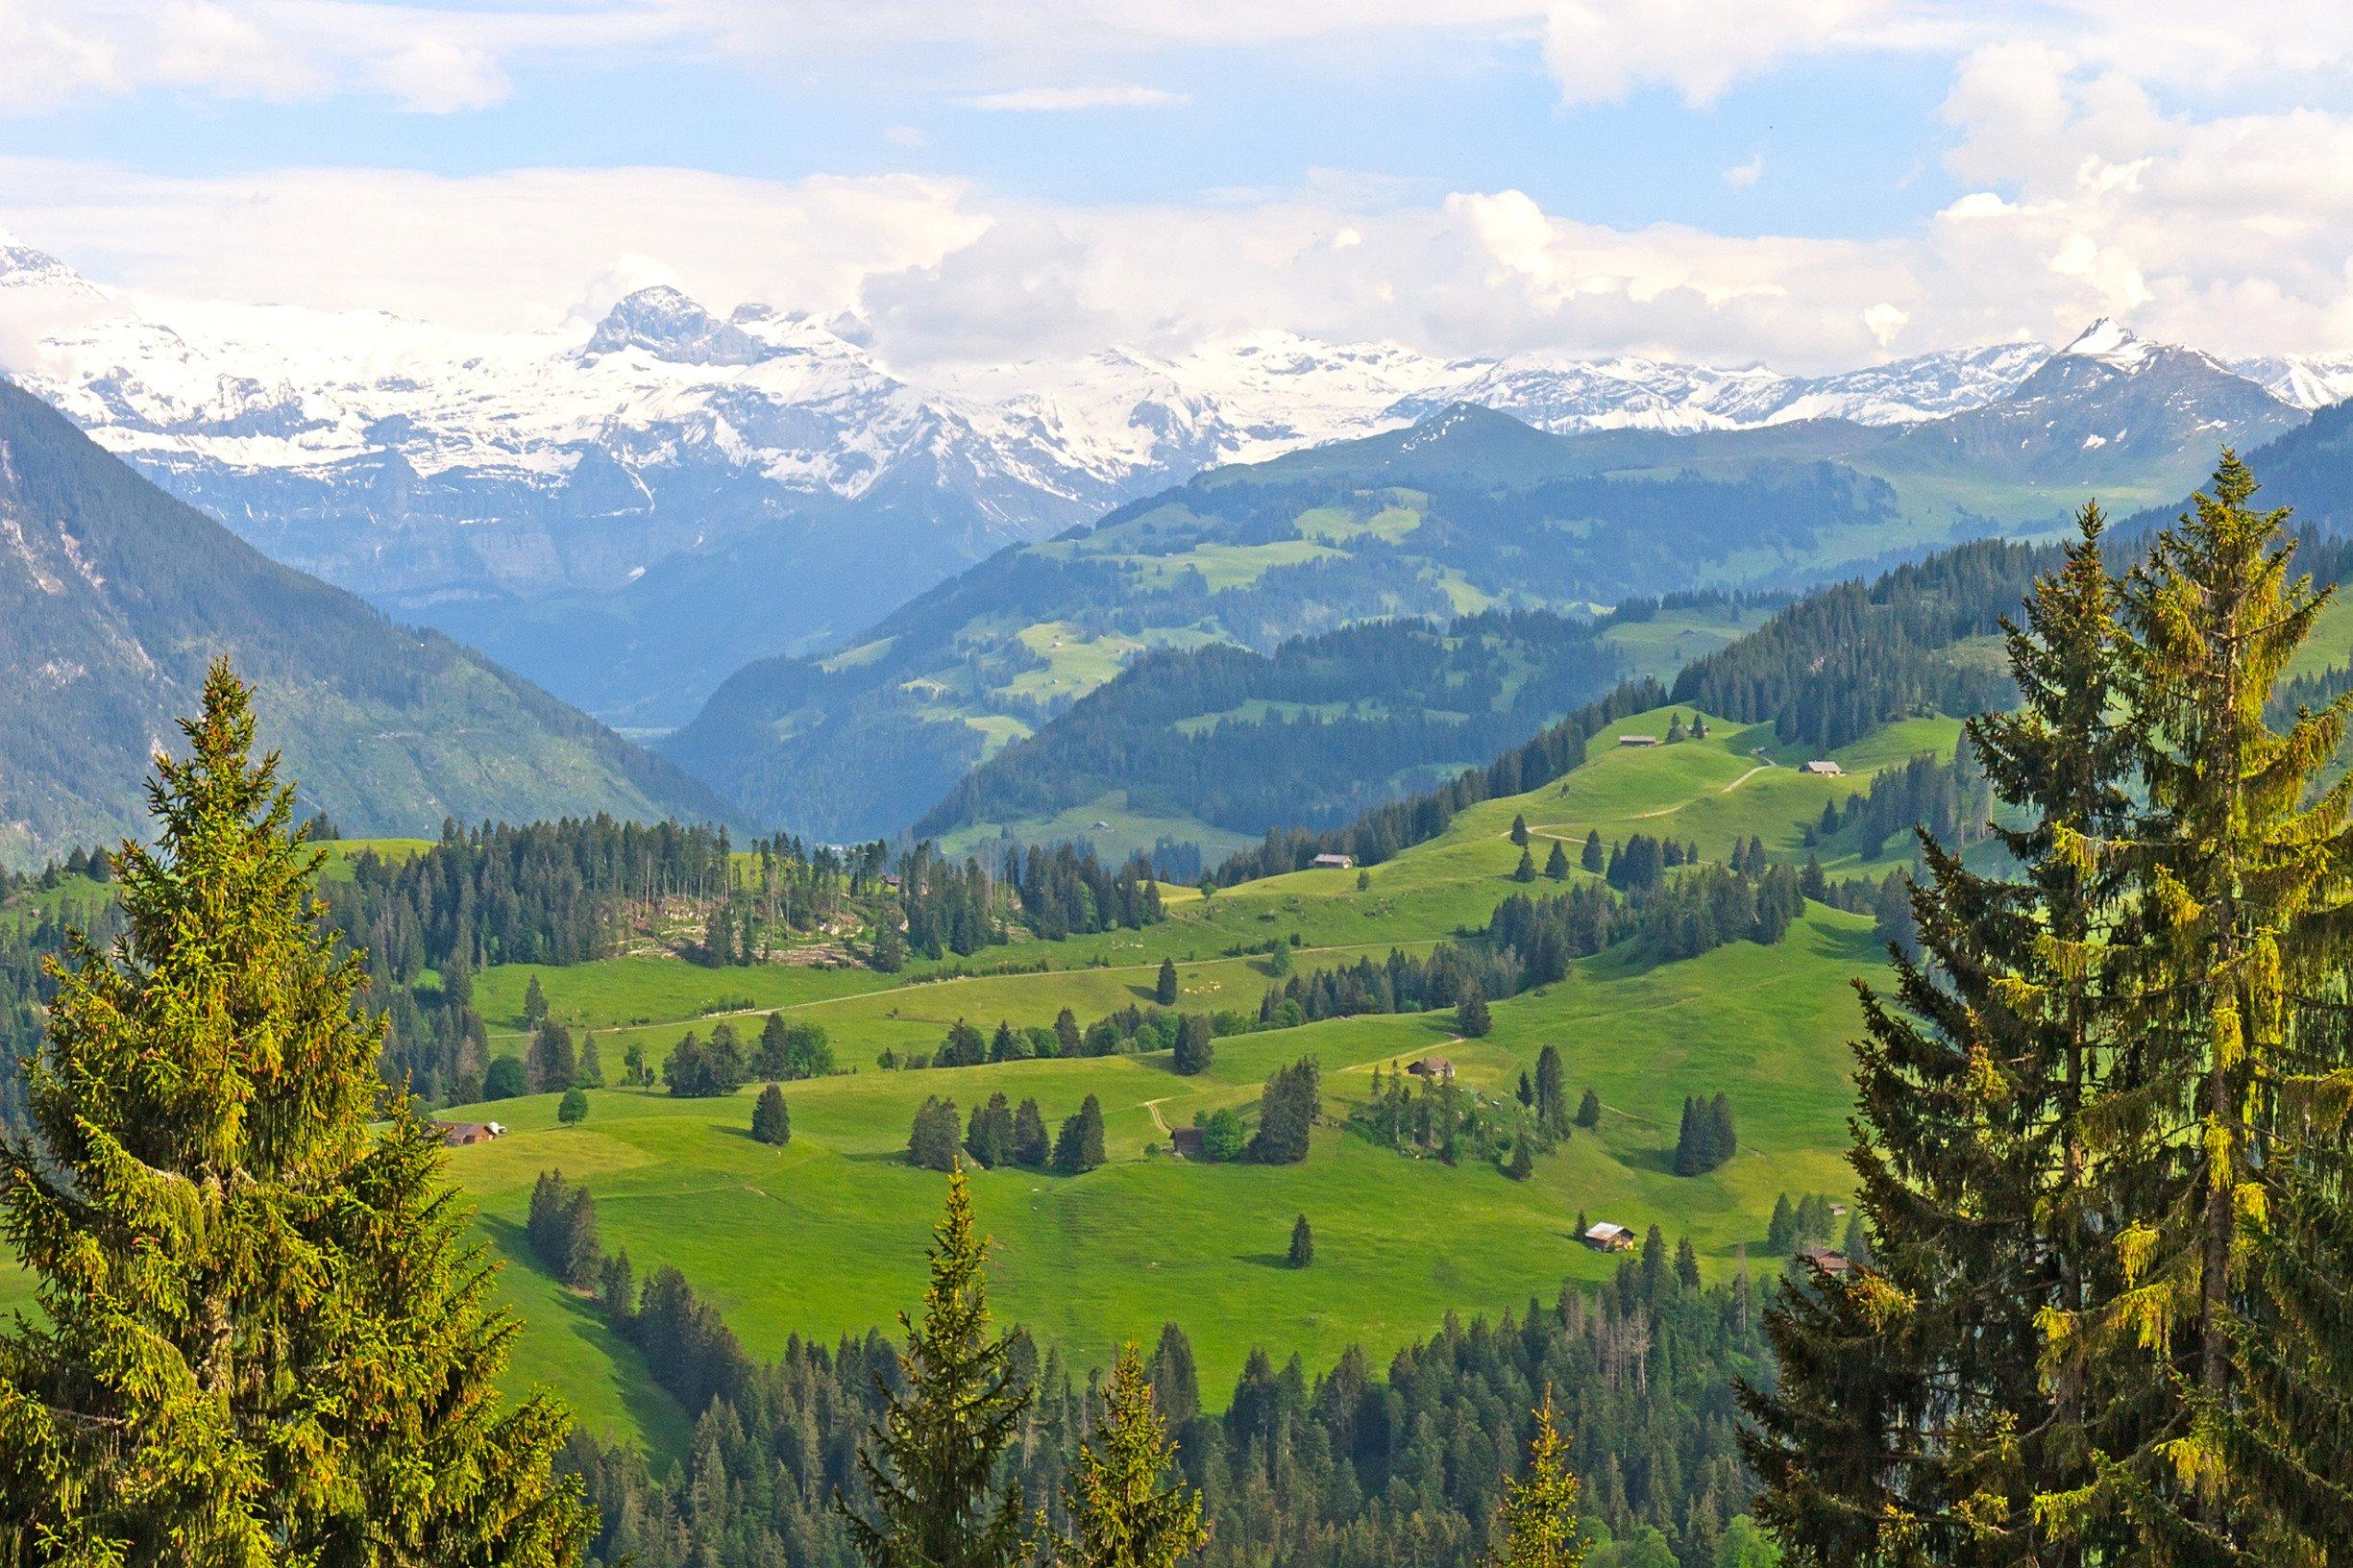 Swiss Alps The Magic Mountain by Thomas Mann